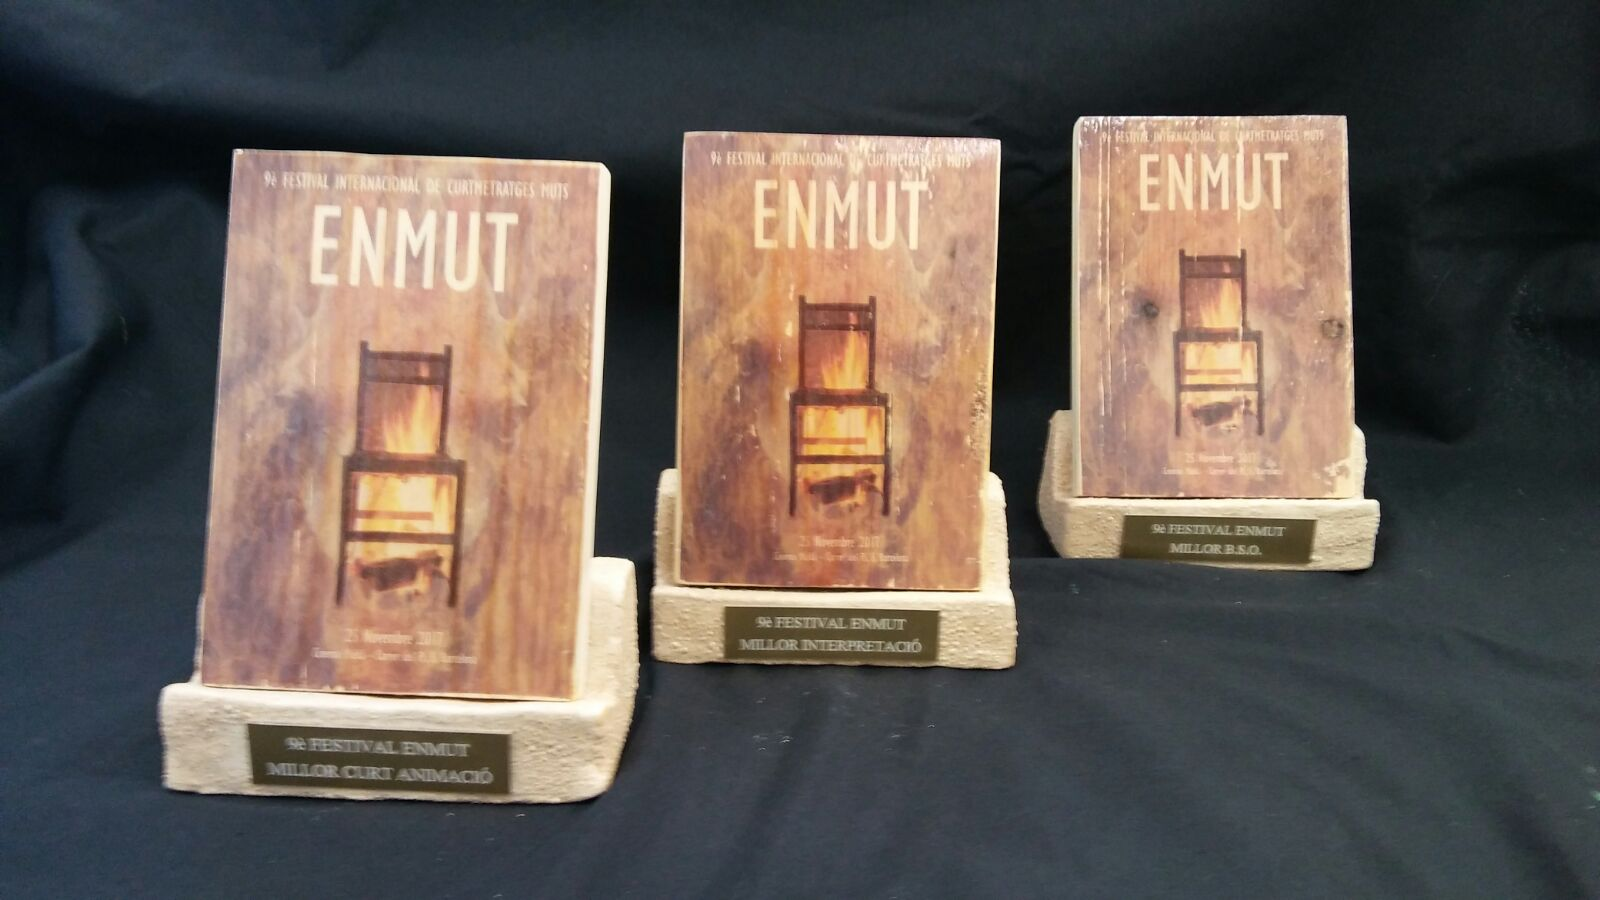 Premis Enmut